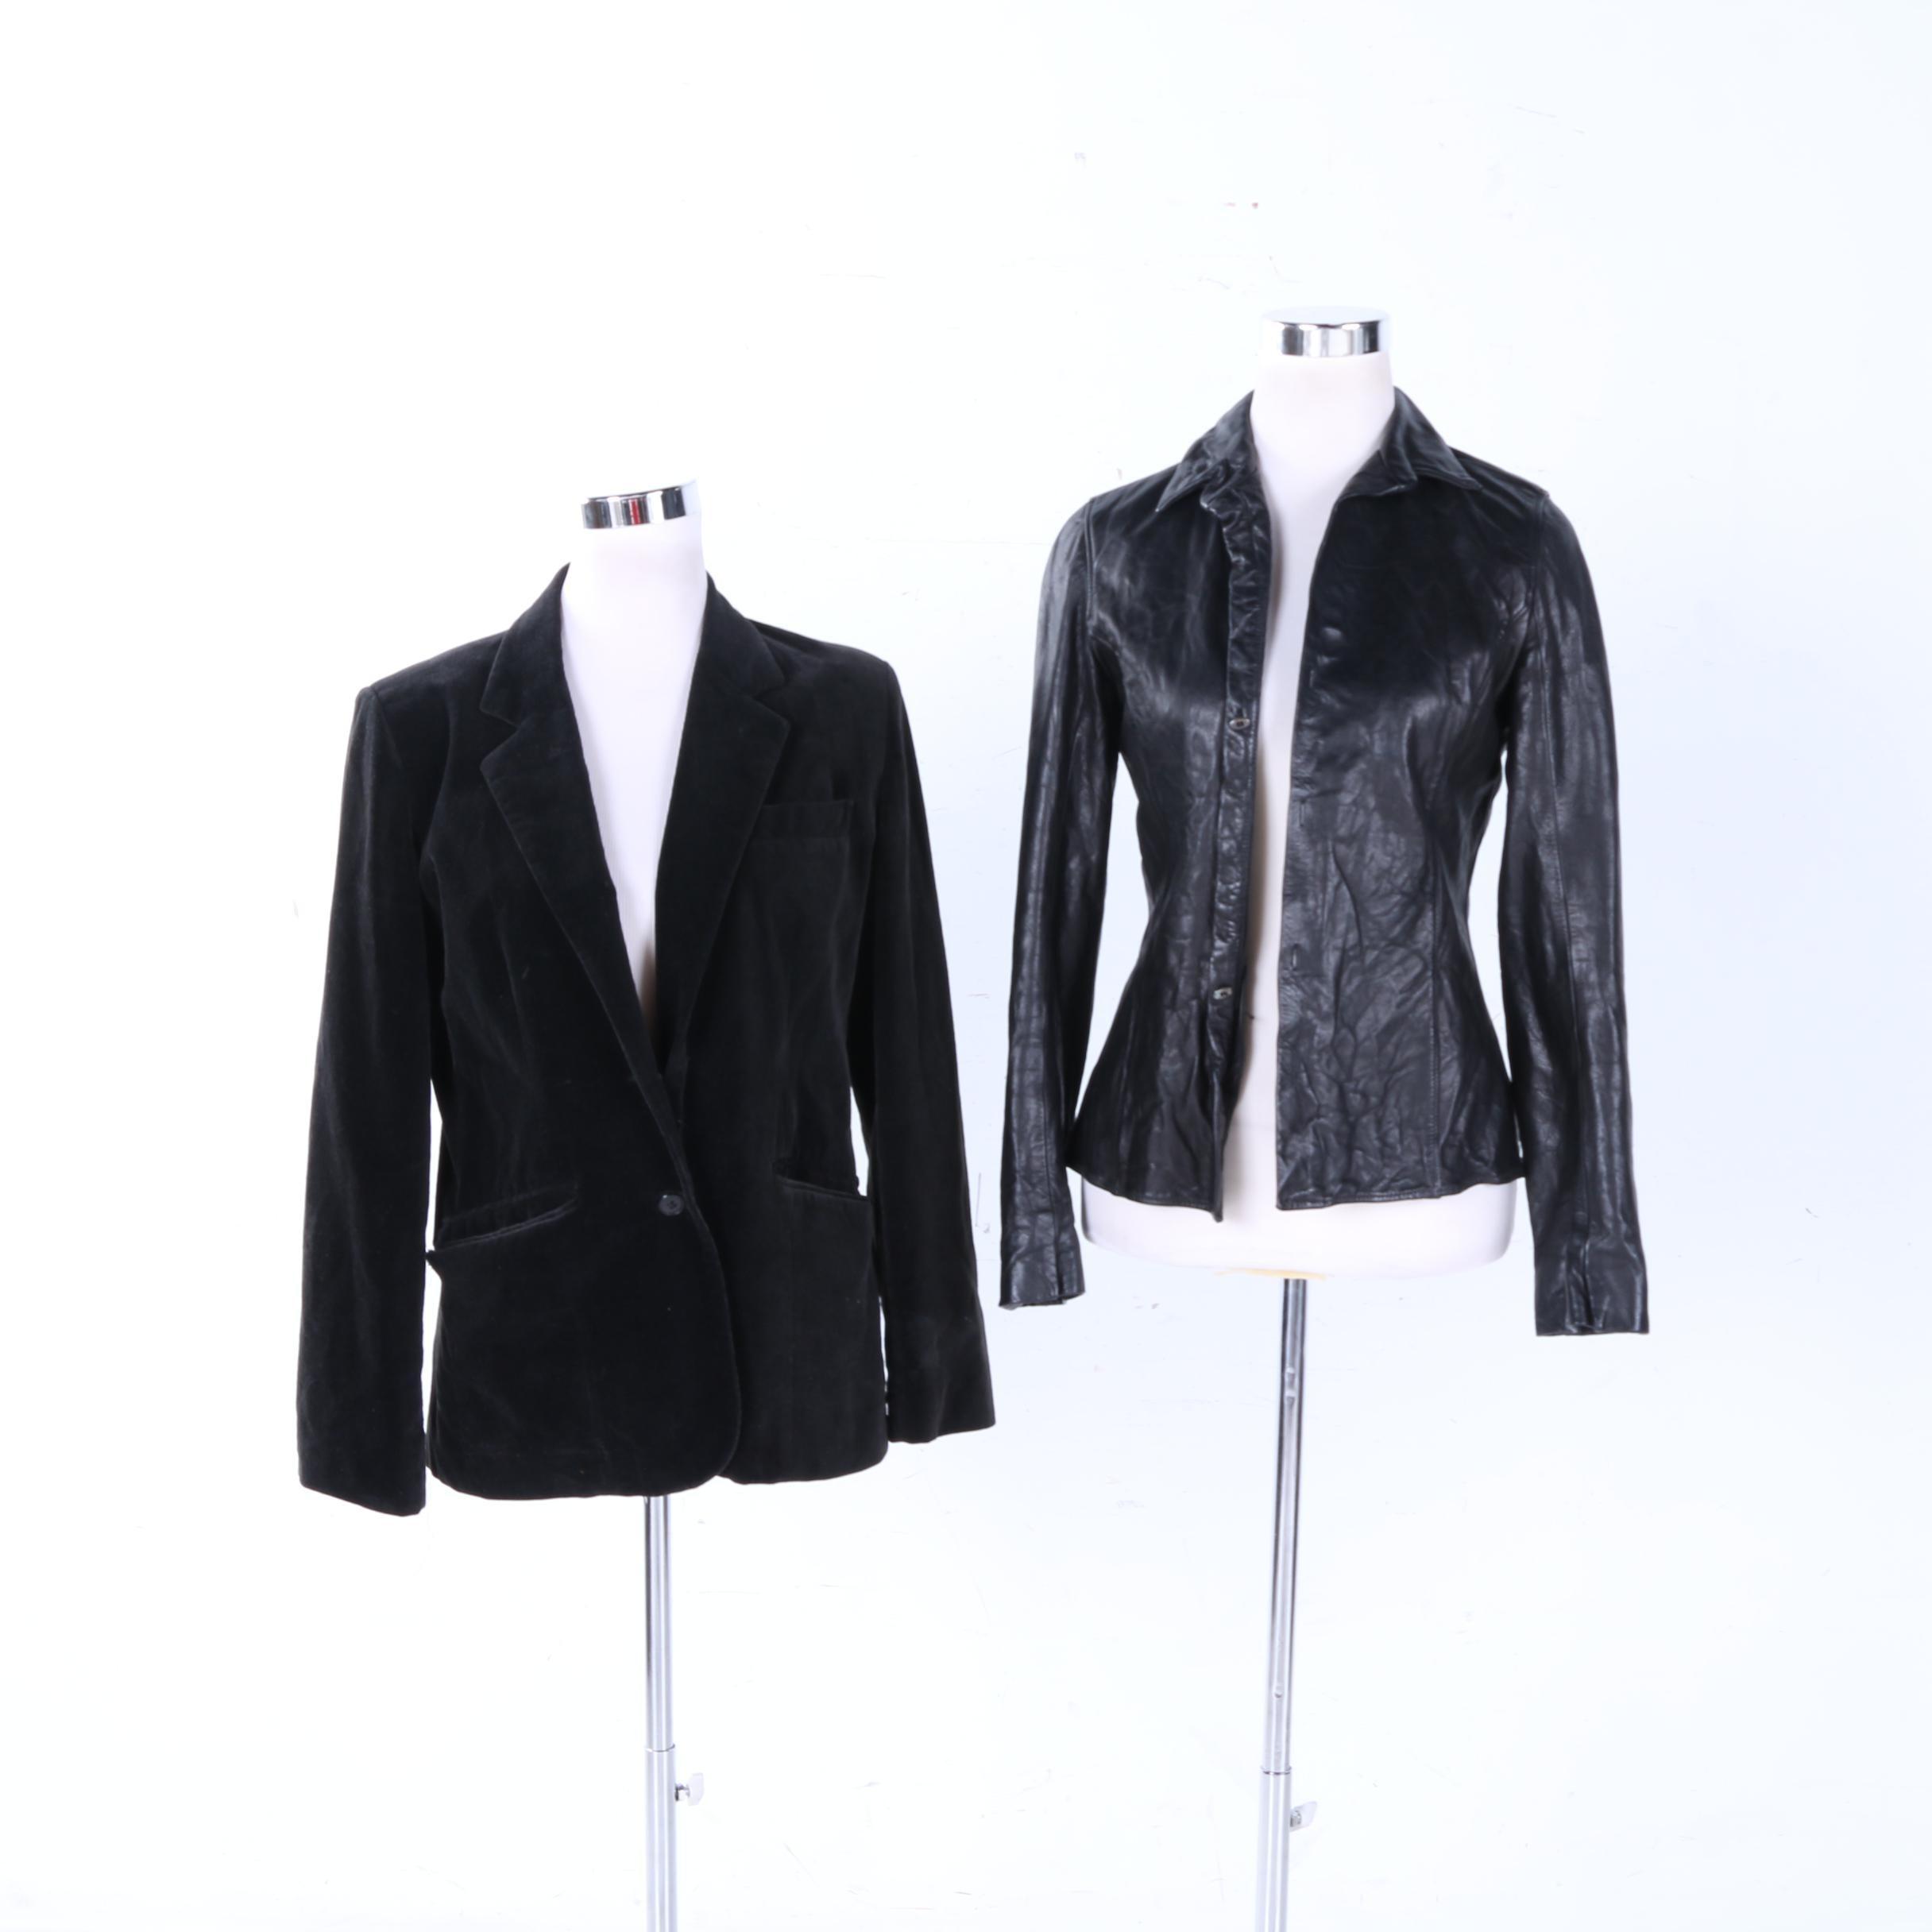 Assorted Women's Jackets